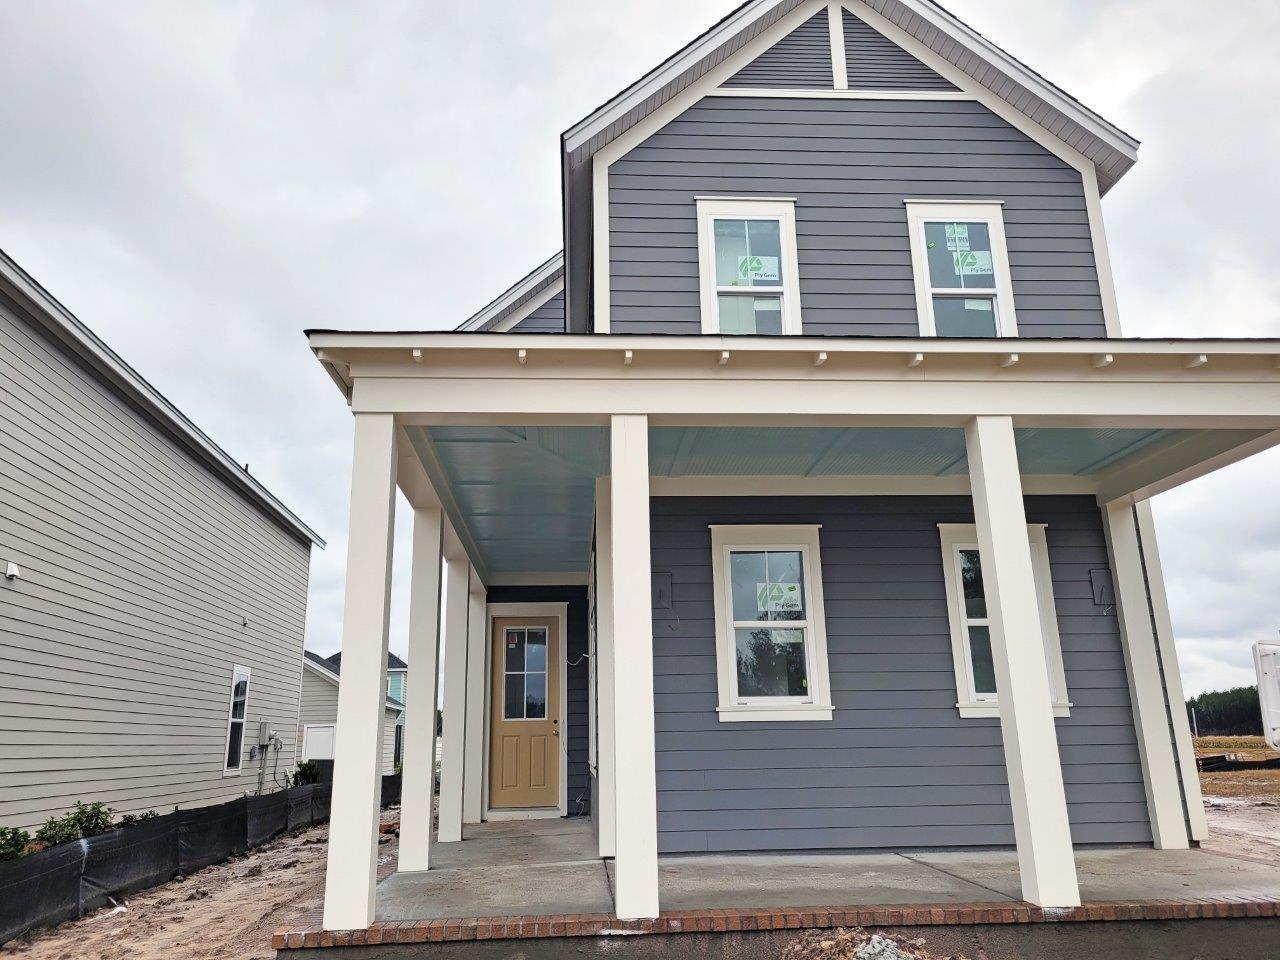 Exterior:135 Midtown Avenue, Homesite 702 Elevation Image 1